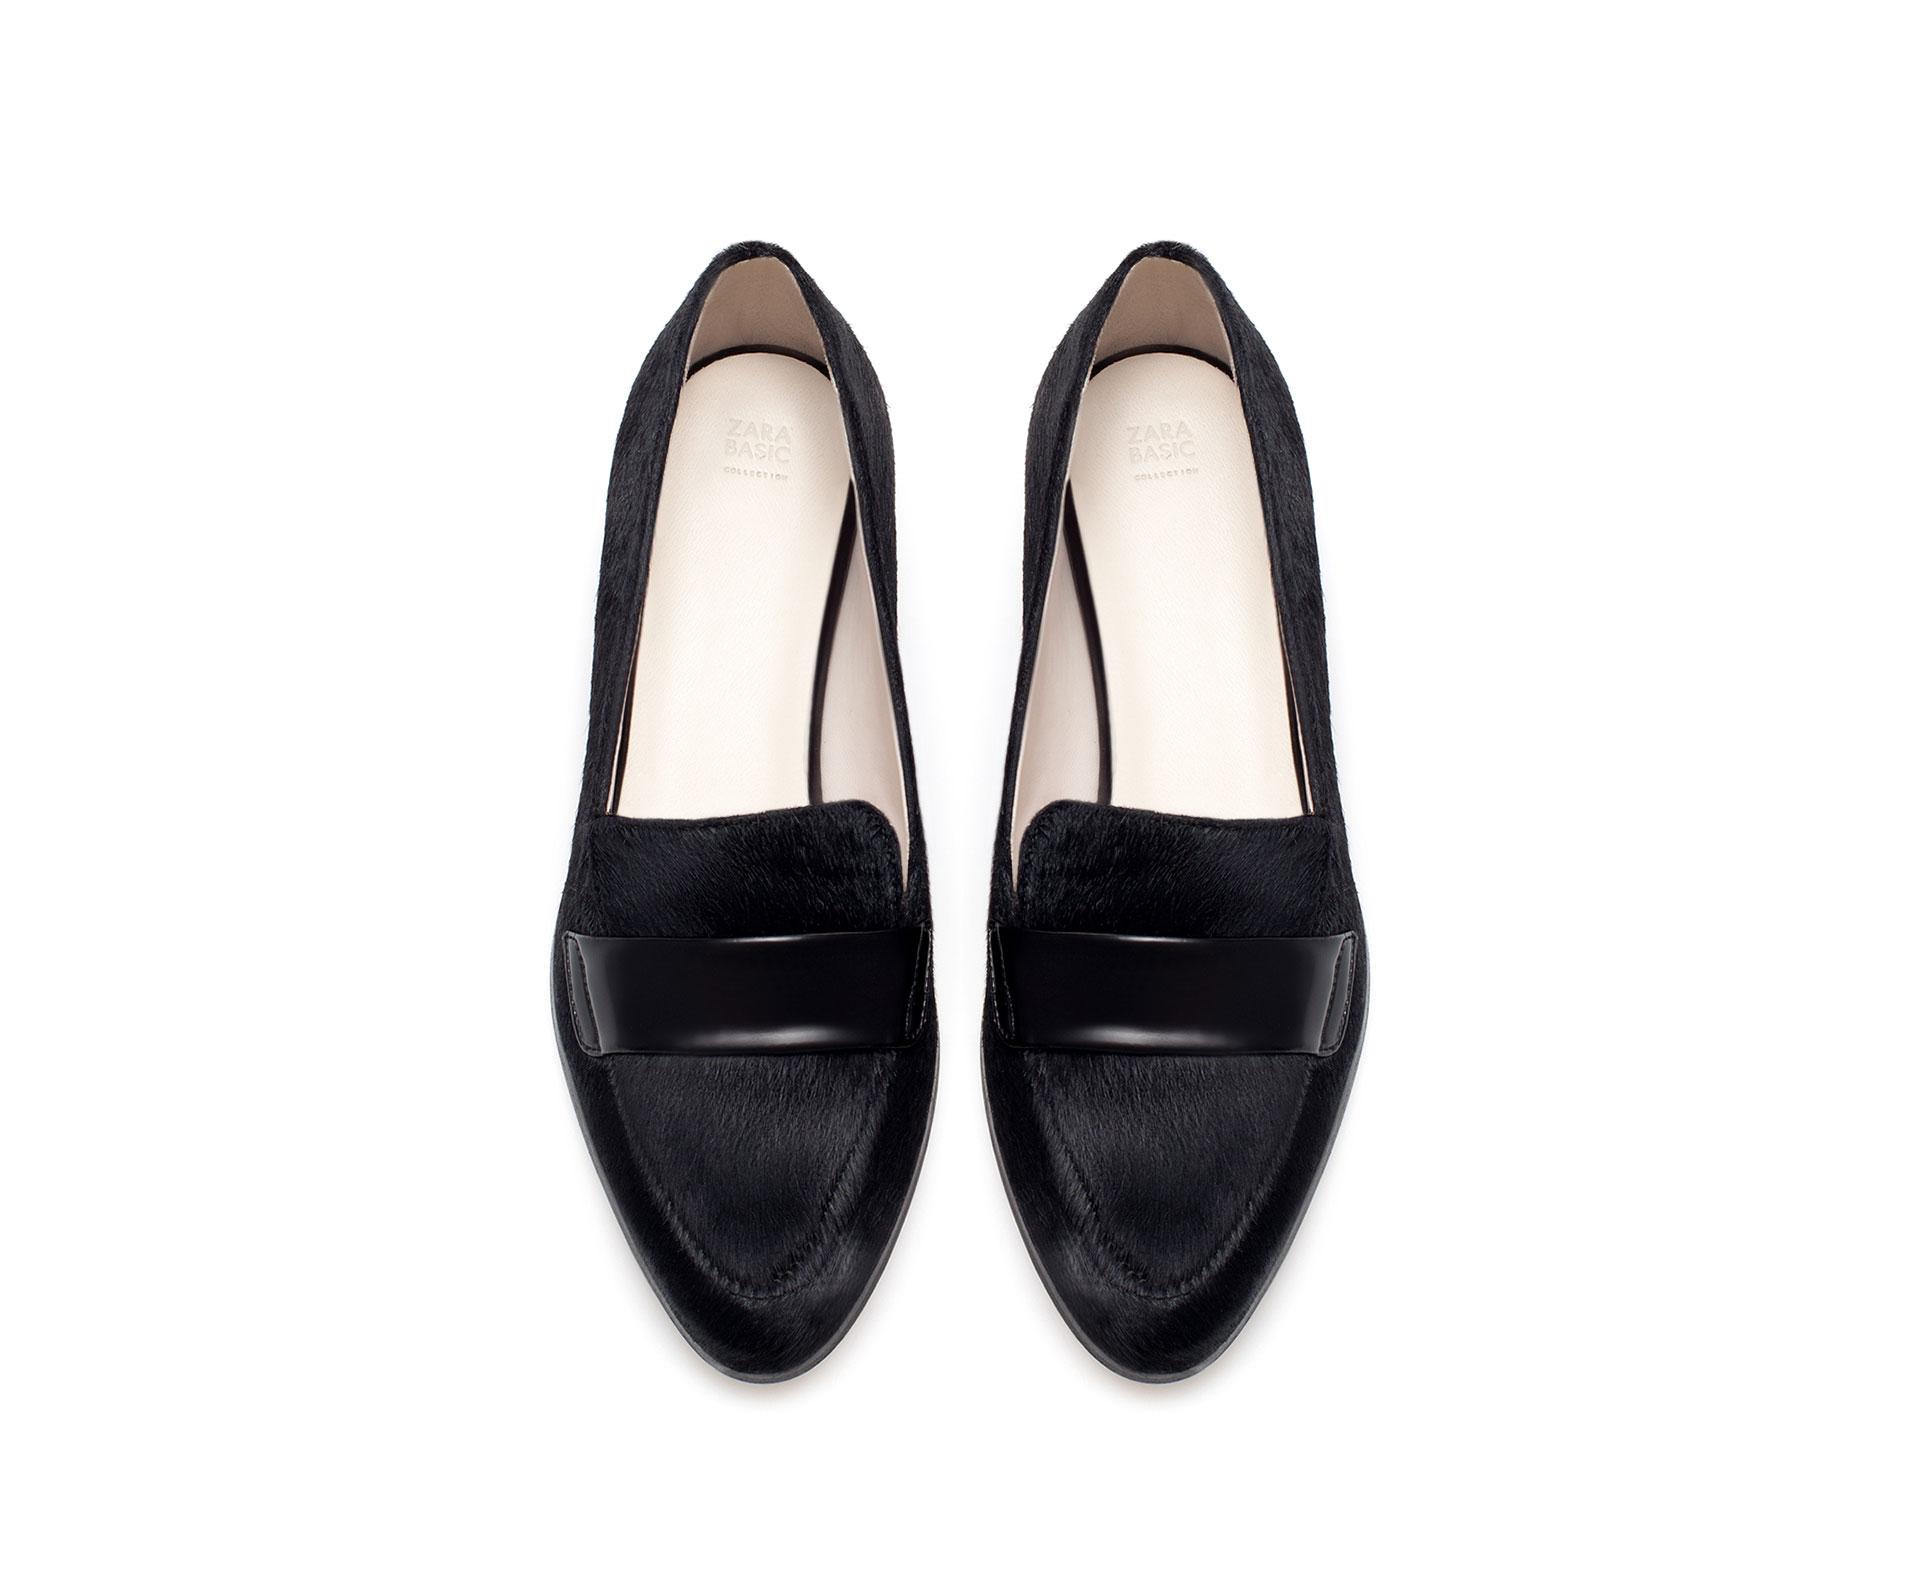 Zara Fur Pointed Moccasin In Black Lyst